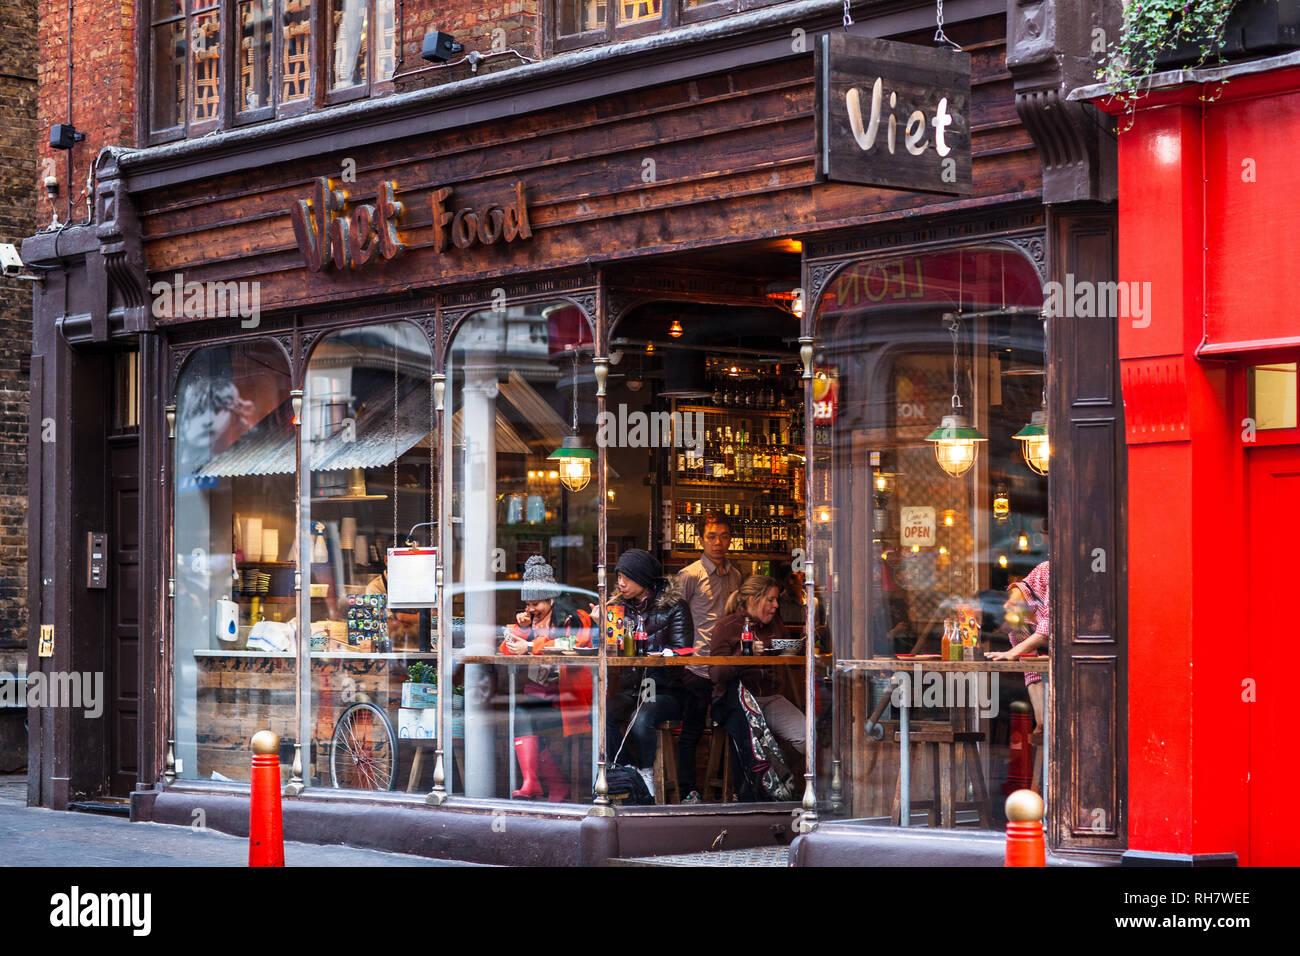 Viet Food Restaurant Soho London  - the Viet Food Vietnamese Restaurant on Wardour Street in London's Soho entertainment district - Stock Image